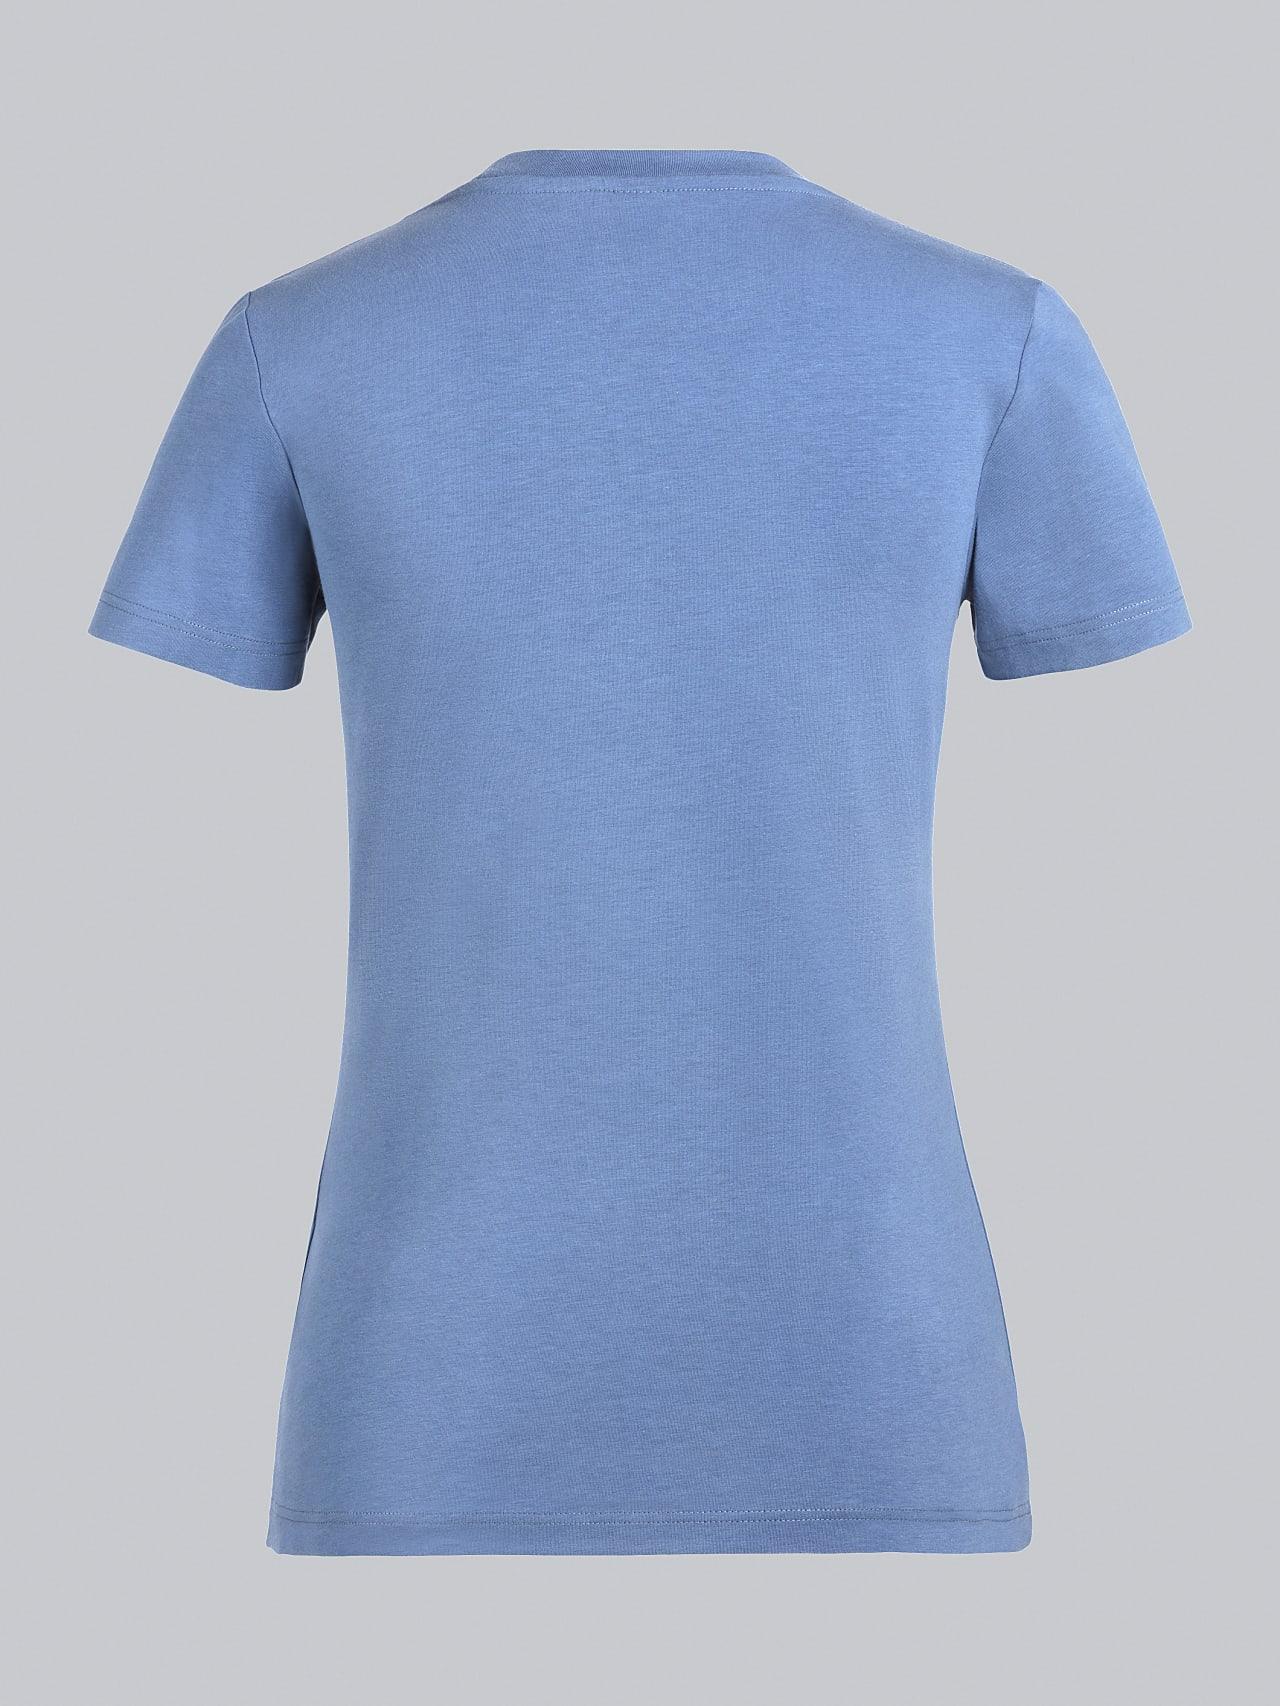 JANPA V1.Y5.02 Logo Print T-Shirt light blue Left Alpha Tauri